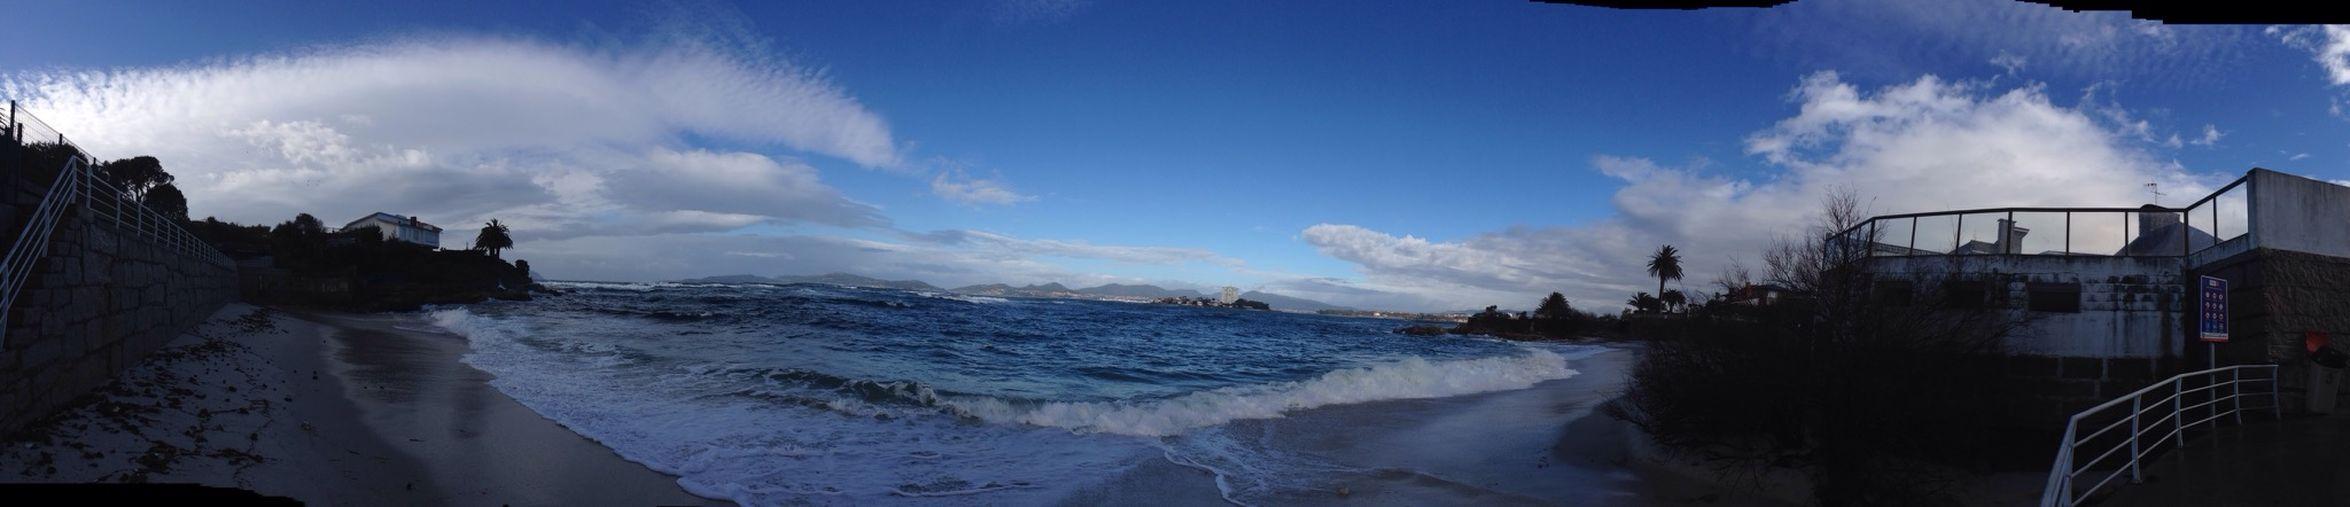 Swimming Vigo, Galicia (España) #vigo #galicia #pontevedra #spain #españa